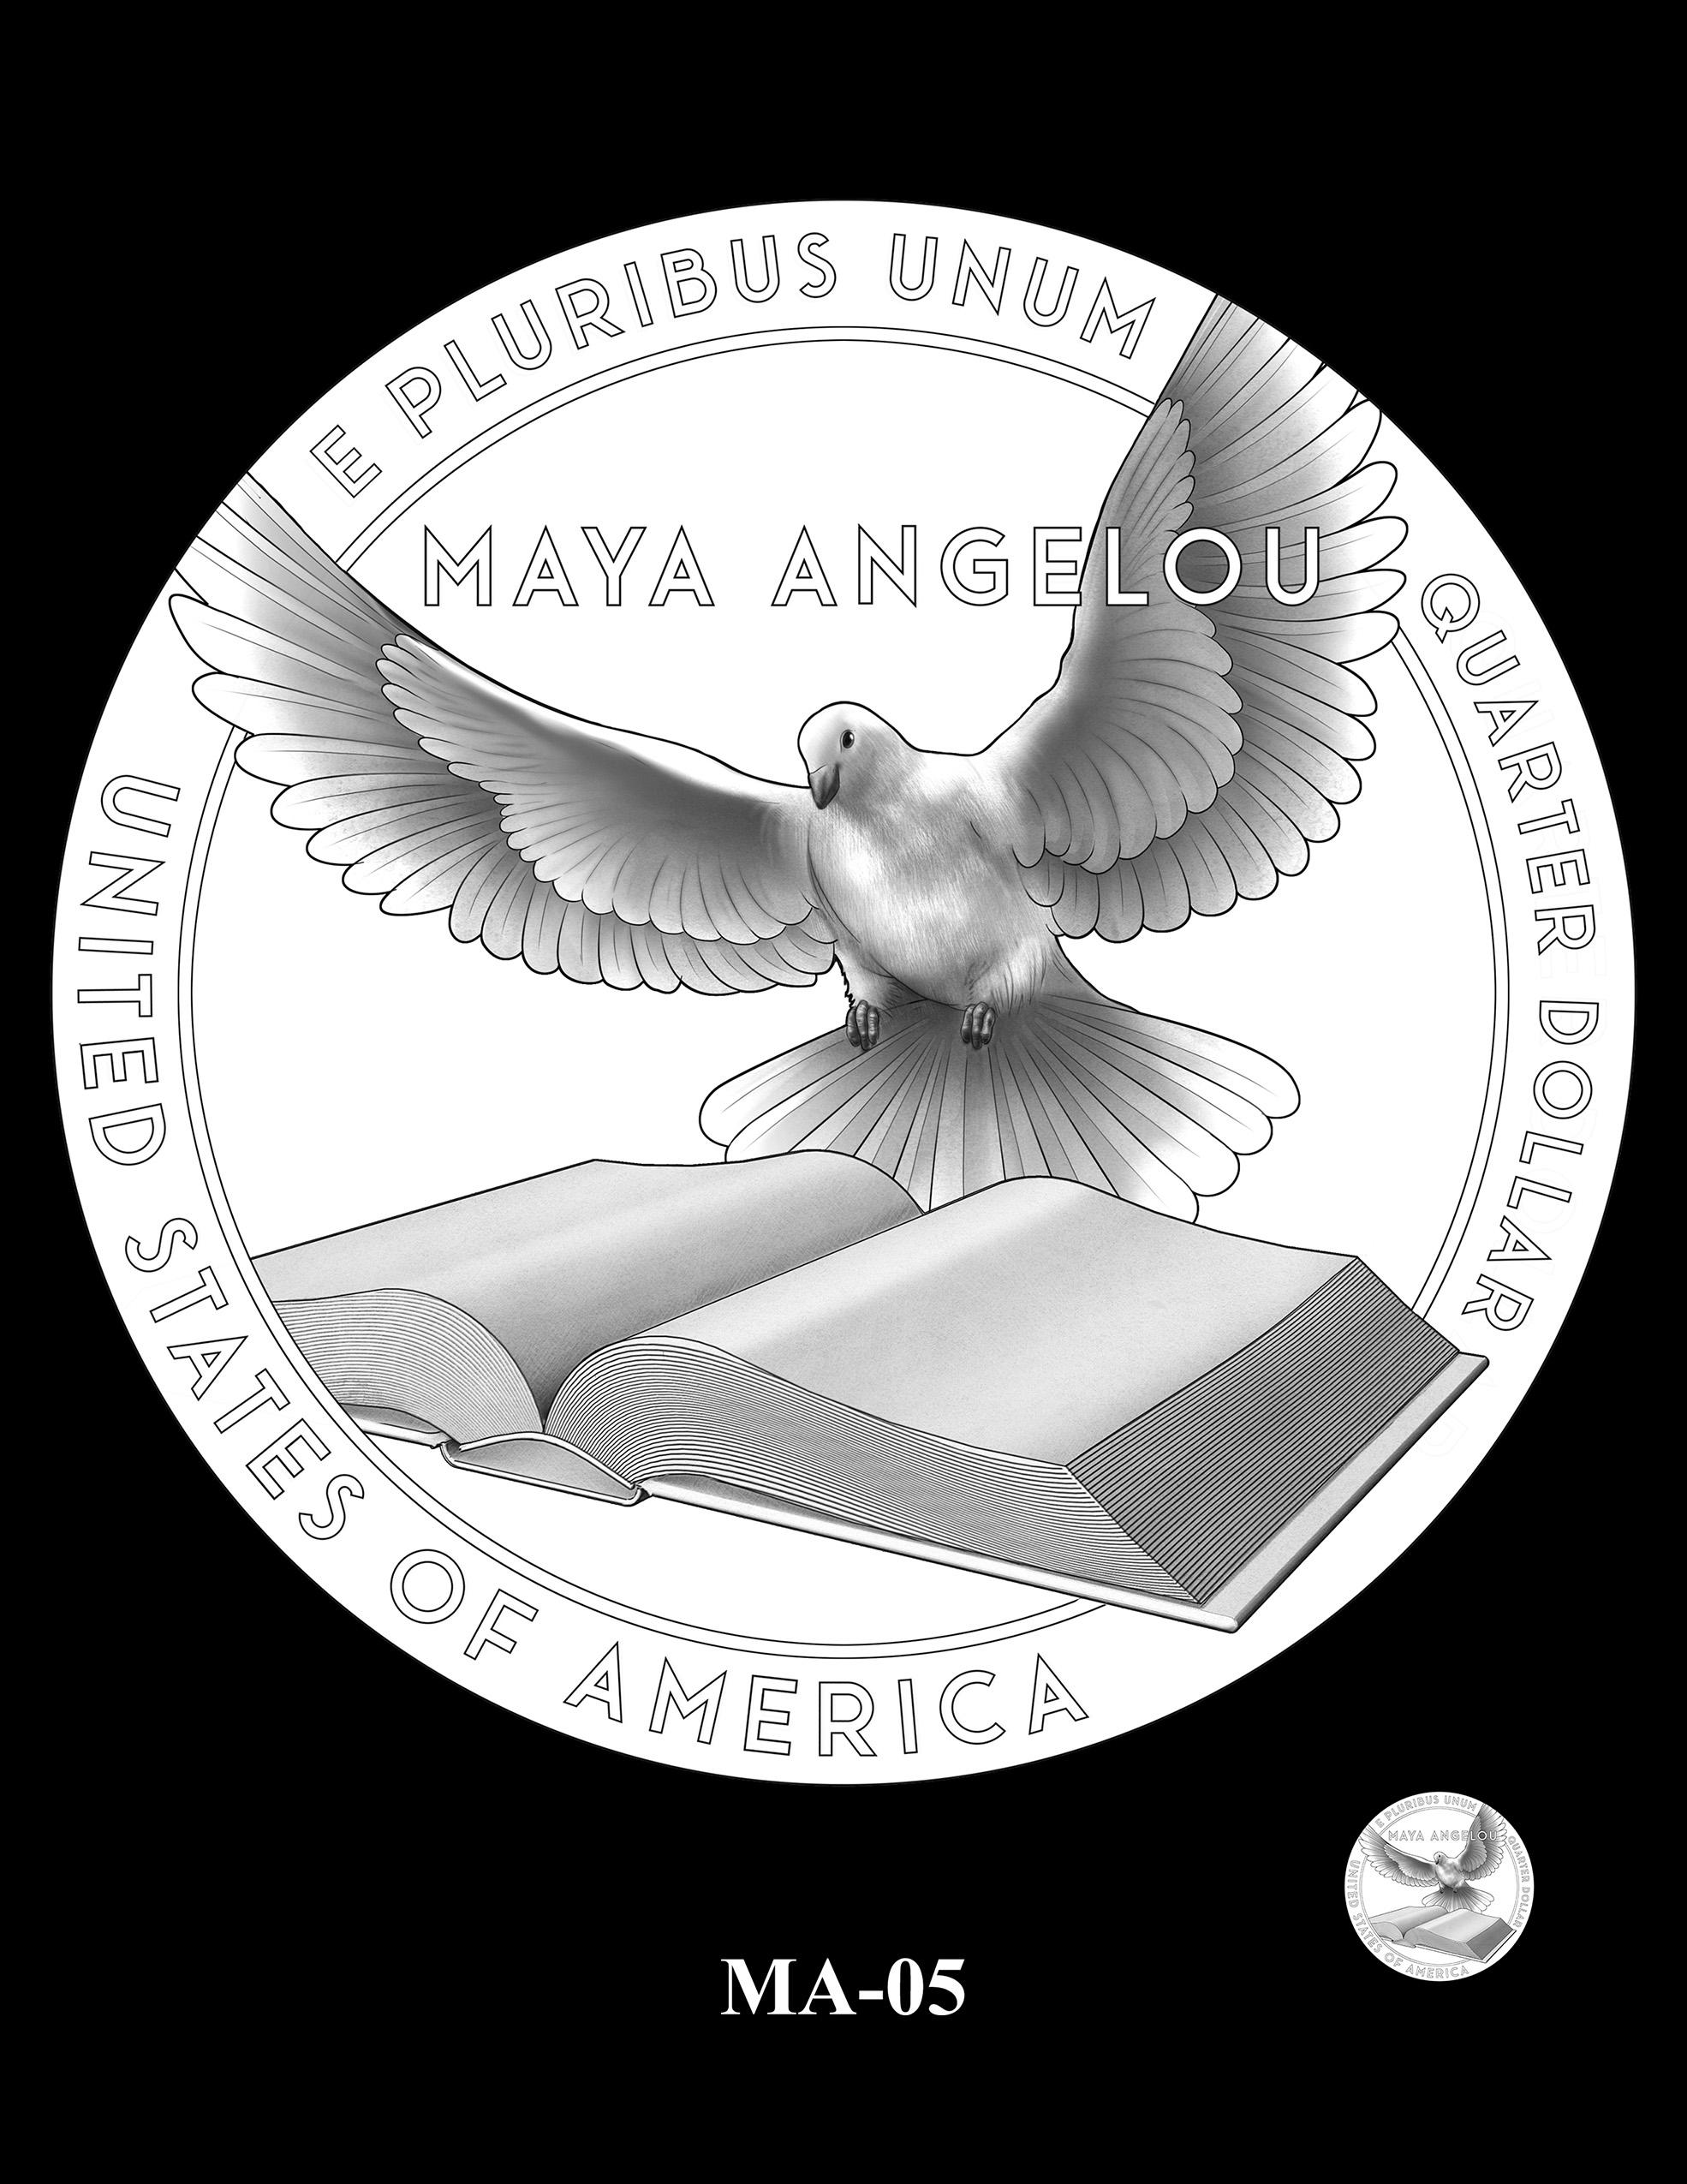 MA-05 -- 2022 American Women Quarters - Maya Angelou Reverse